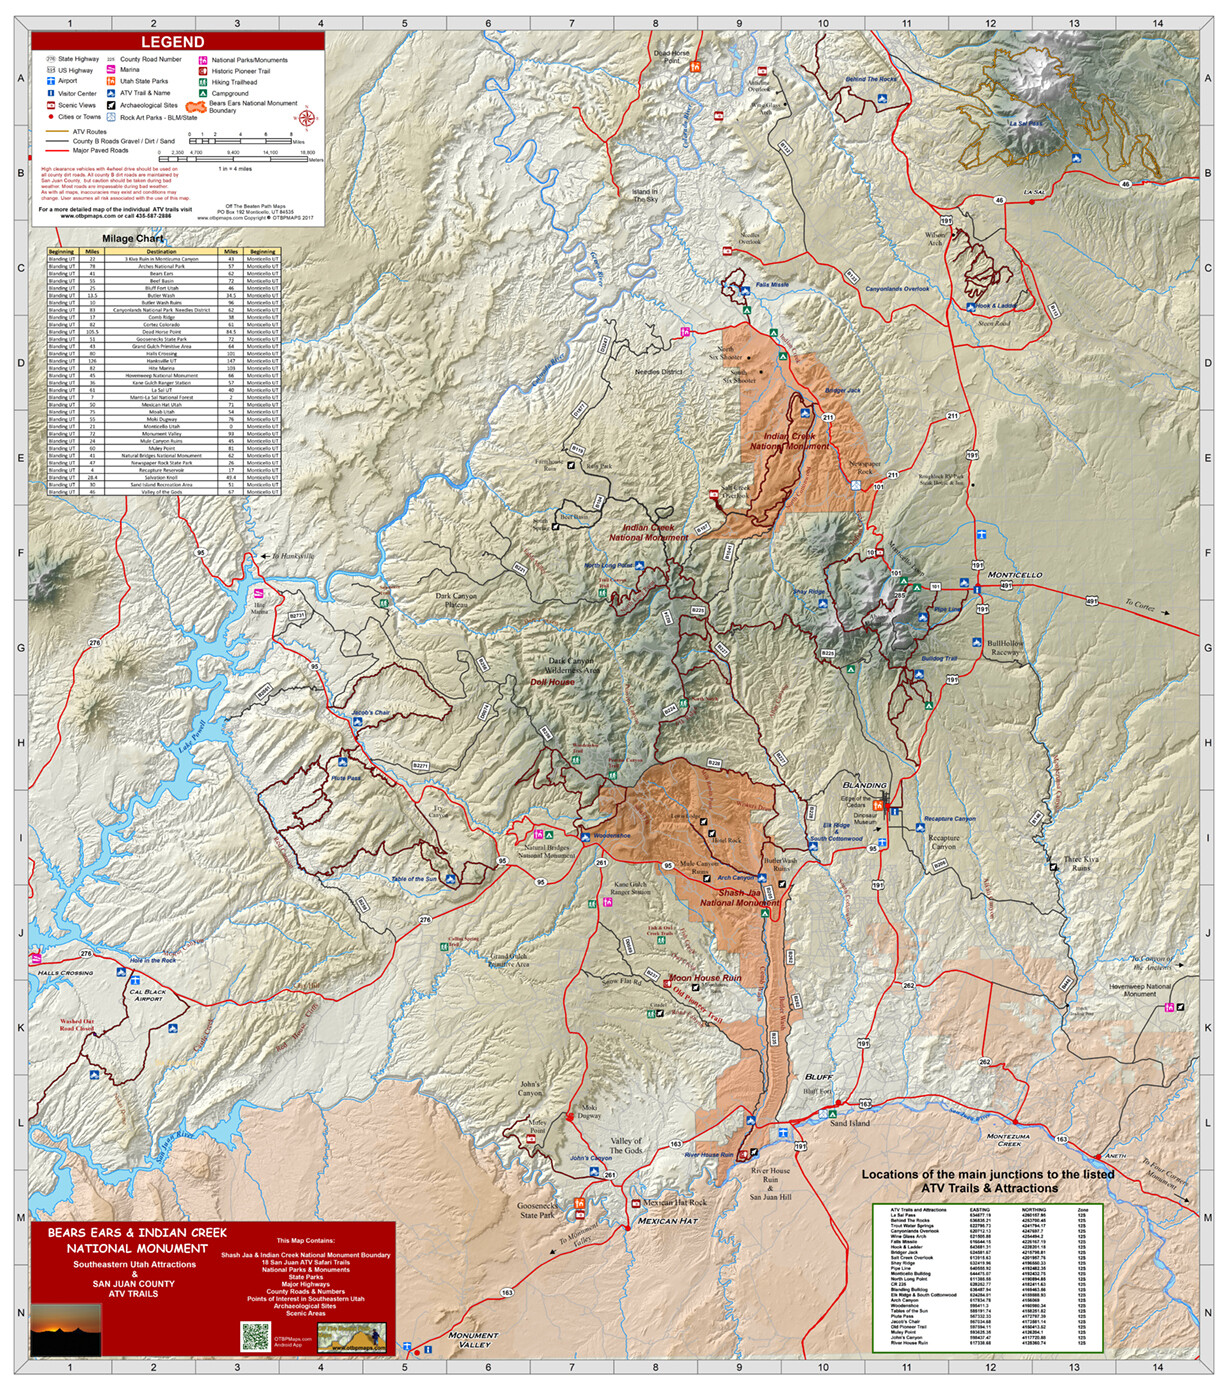 Bears Ears National Monument & San Juan County Utah Attractions